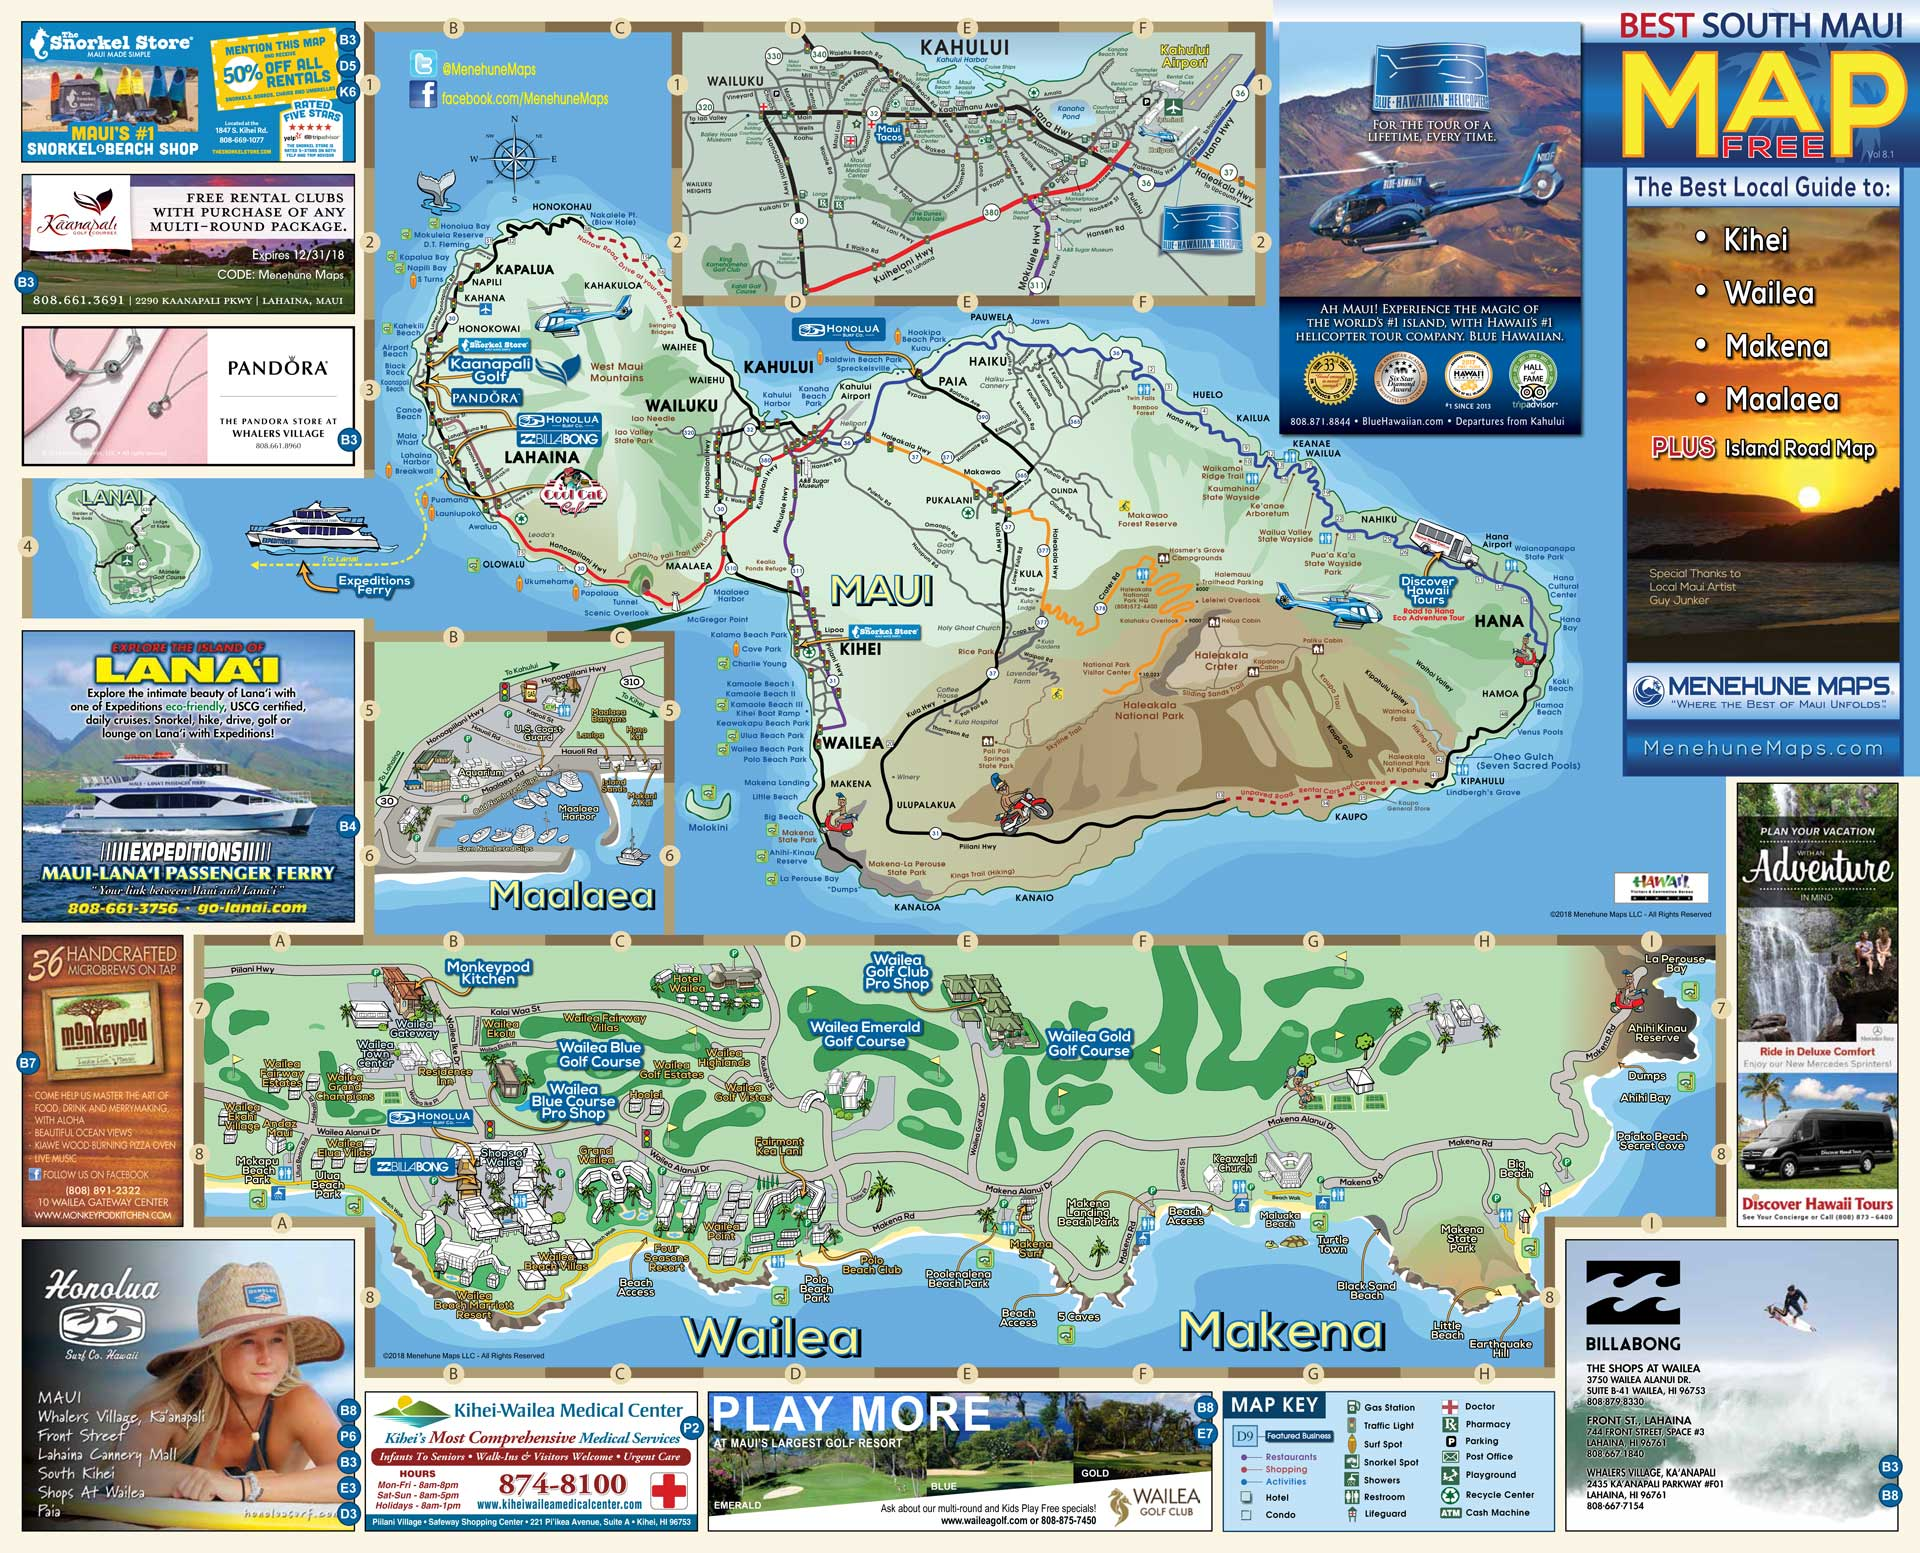 Order FREE Maps | Menehune Maps